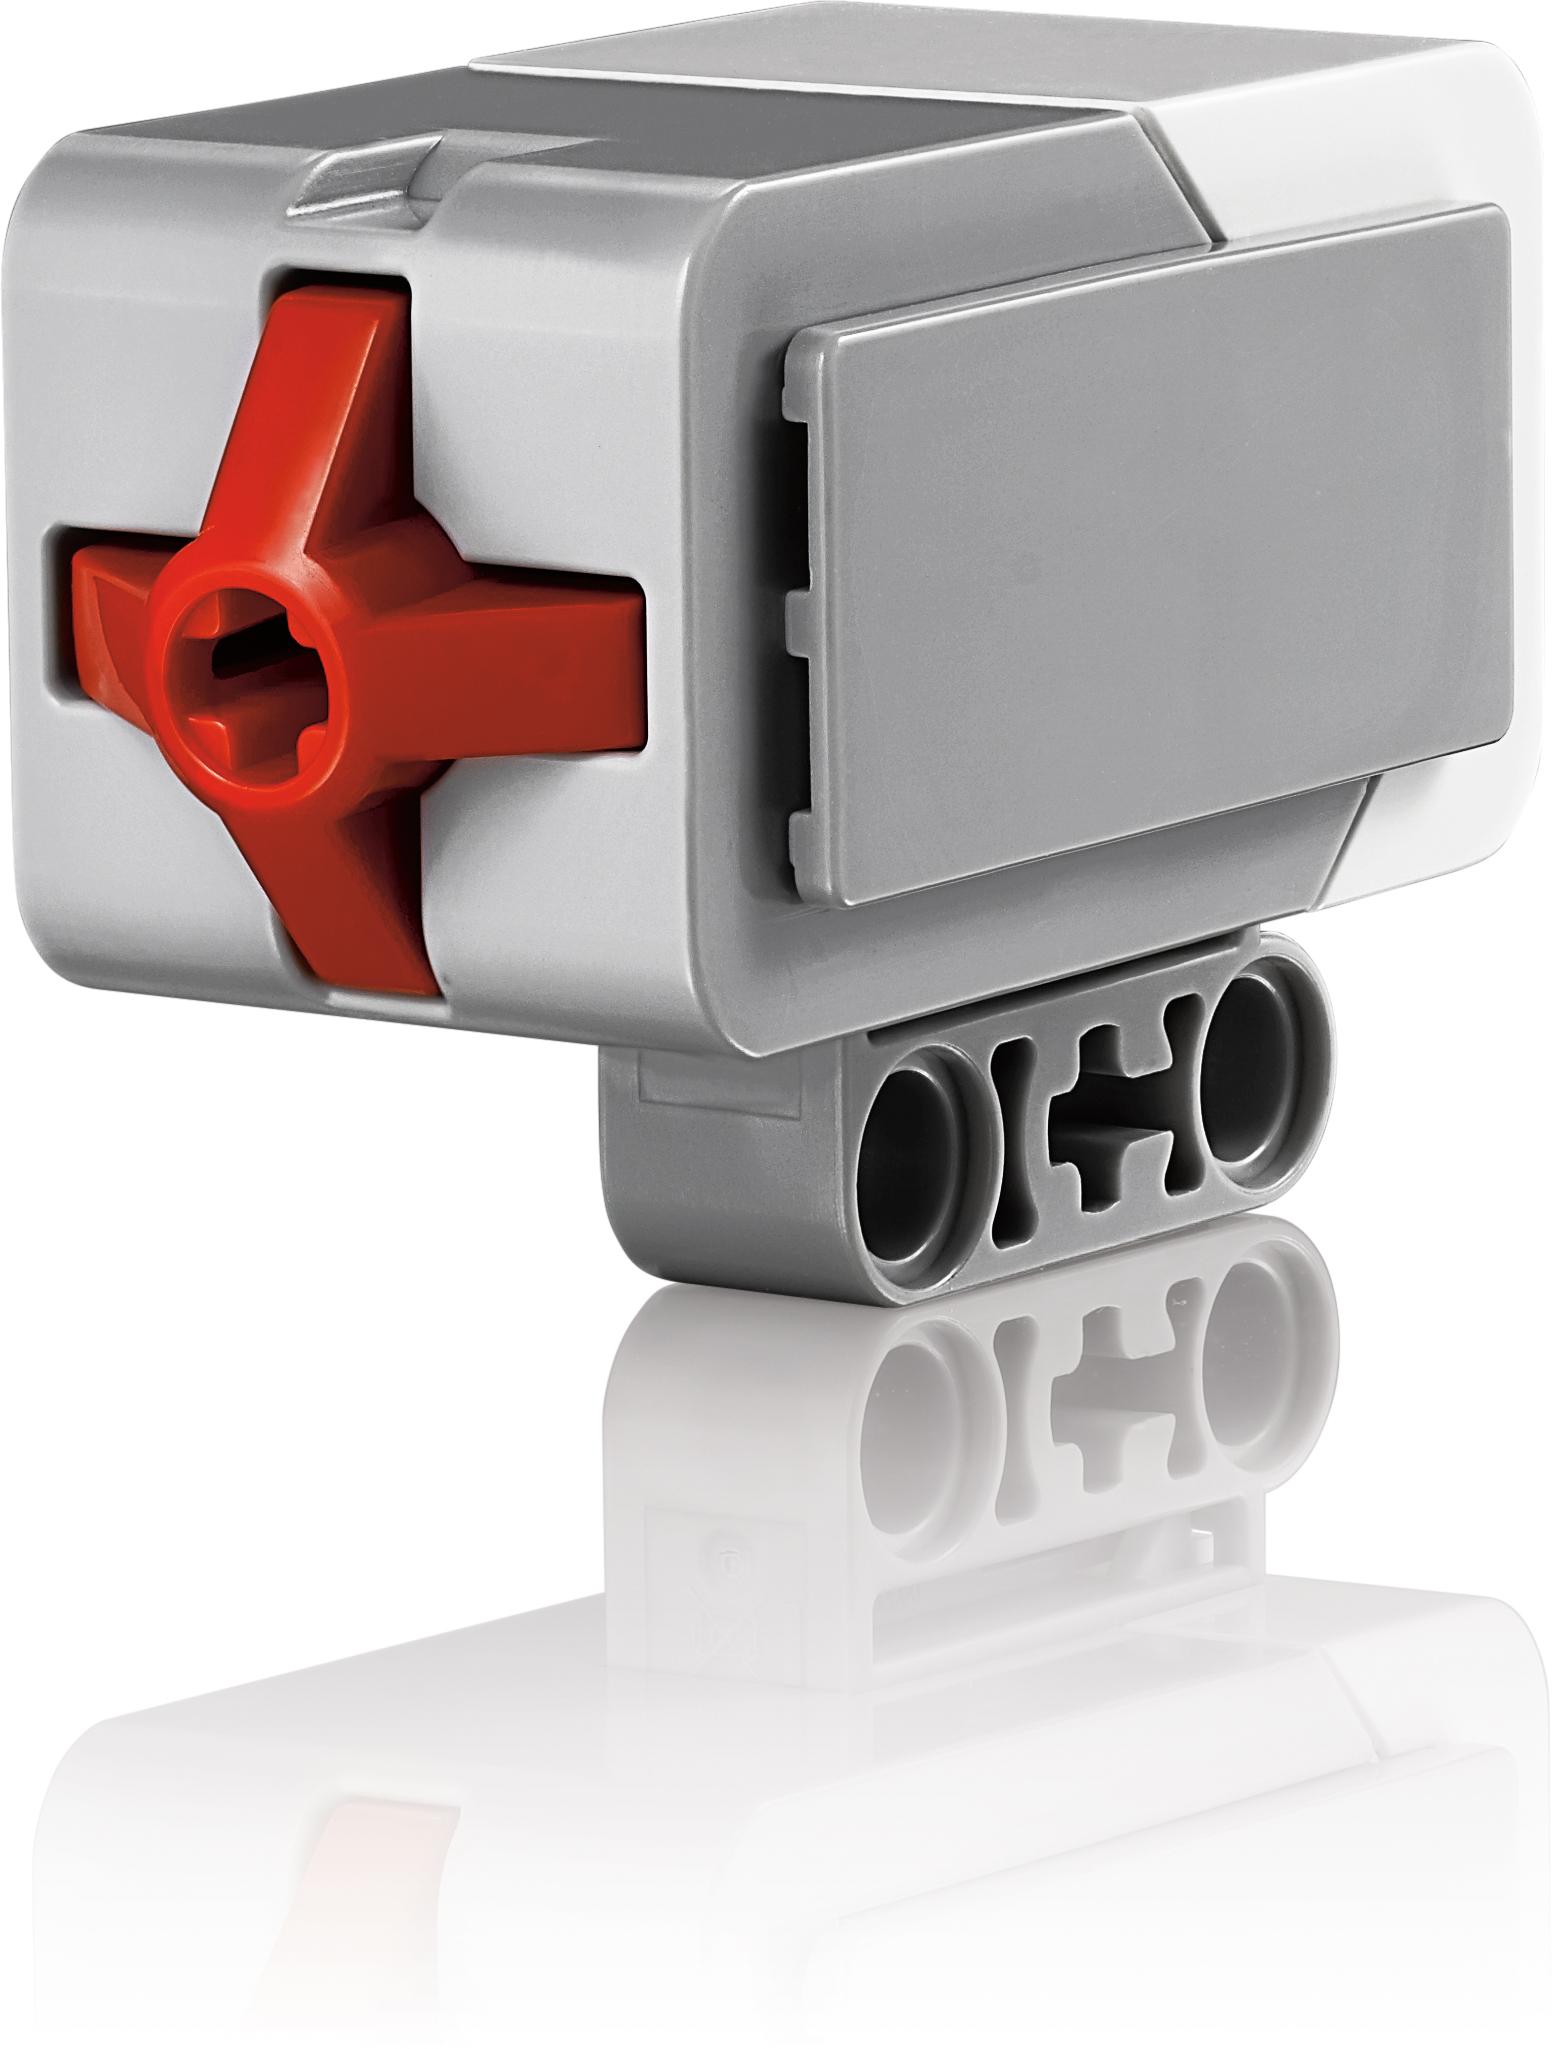 Lego Mindstorms EV3: Neue Roboterplattform von Lego - Lego Mindstorms EV3: Touch-Sensor